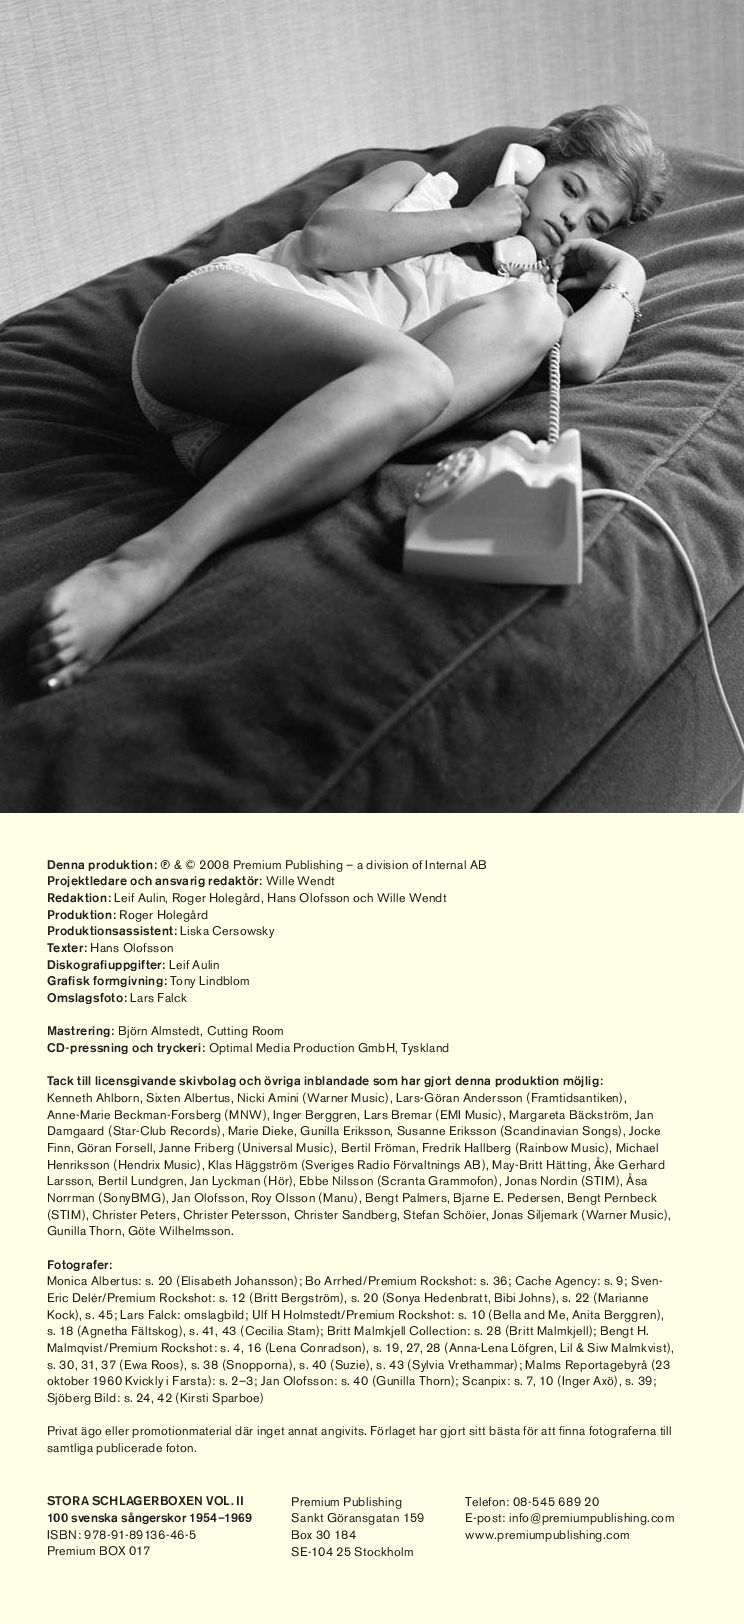 stora schlagerboxen volume ii by premium publishing issuu. Black Bedroom Furniture Sets. Home Design Ideas